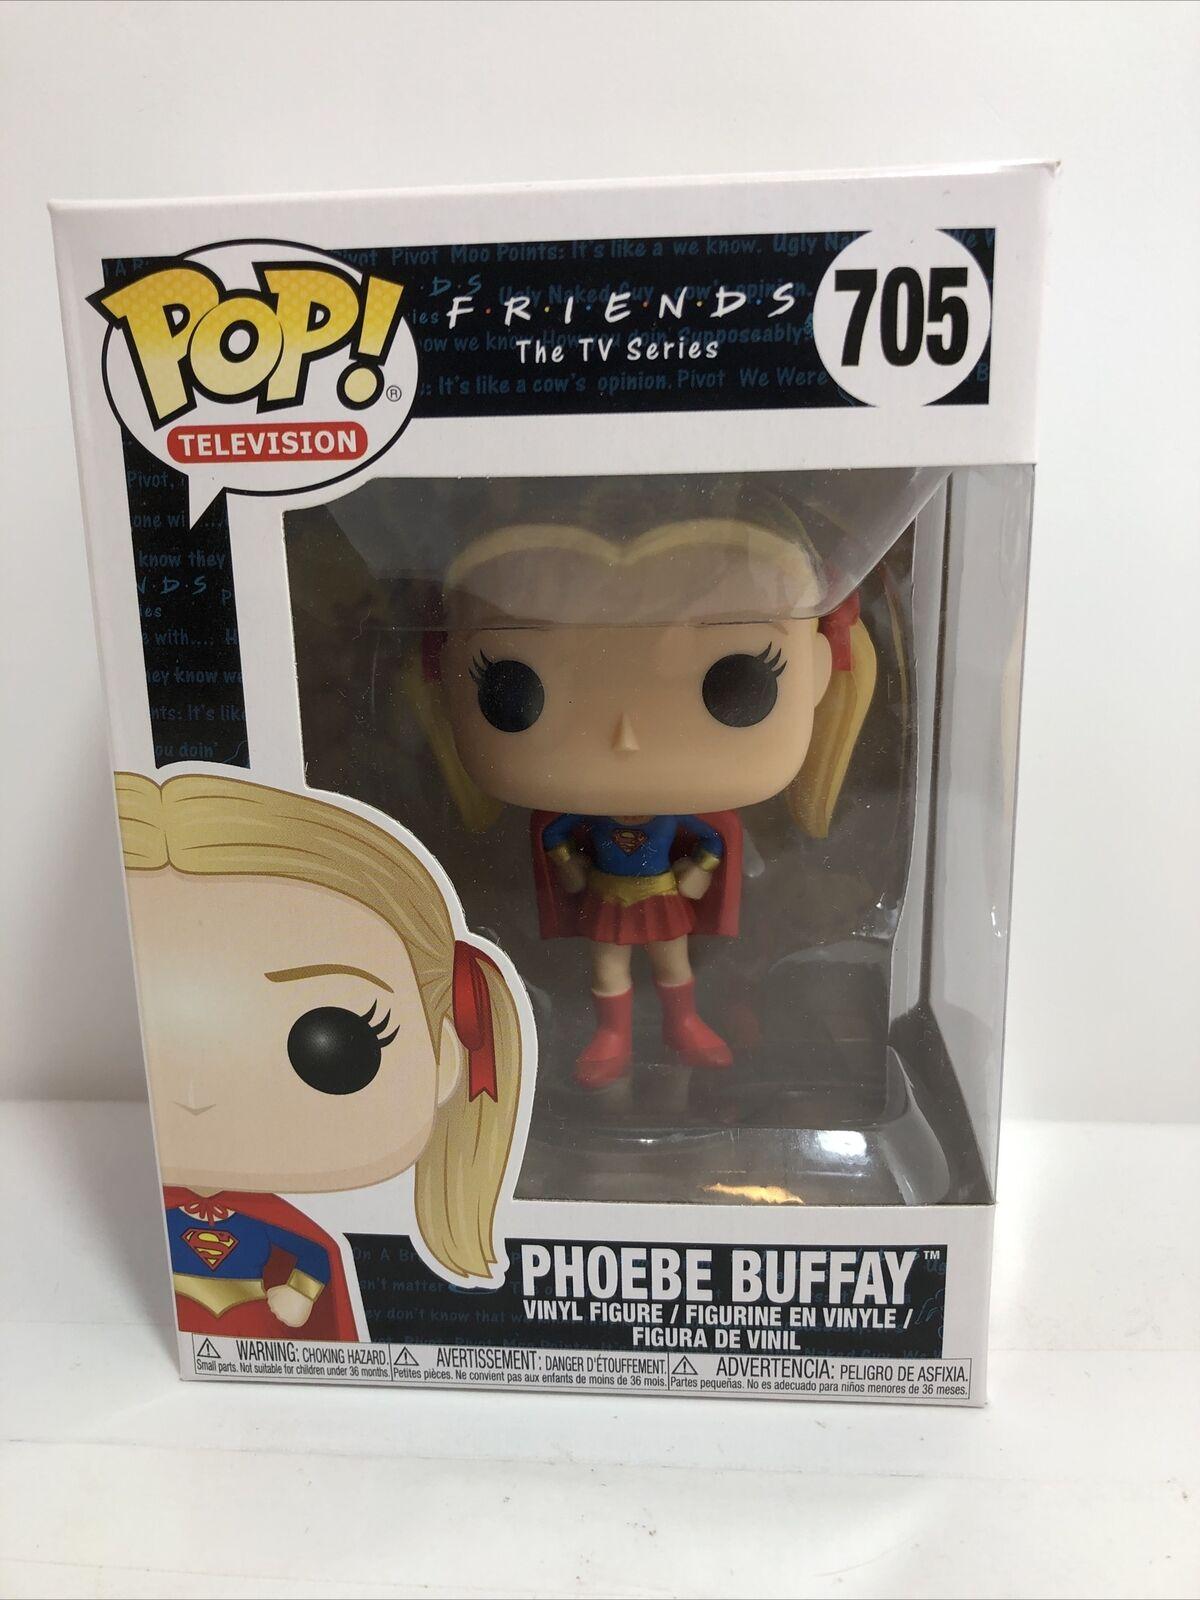 Funko Pop Television: Friends the TV Series - Phoebe Buffay Vinyl Figure #705